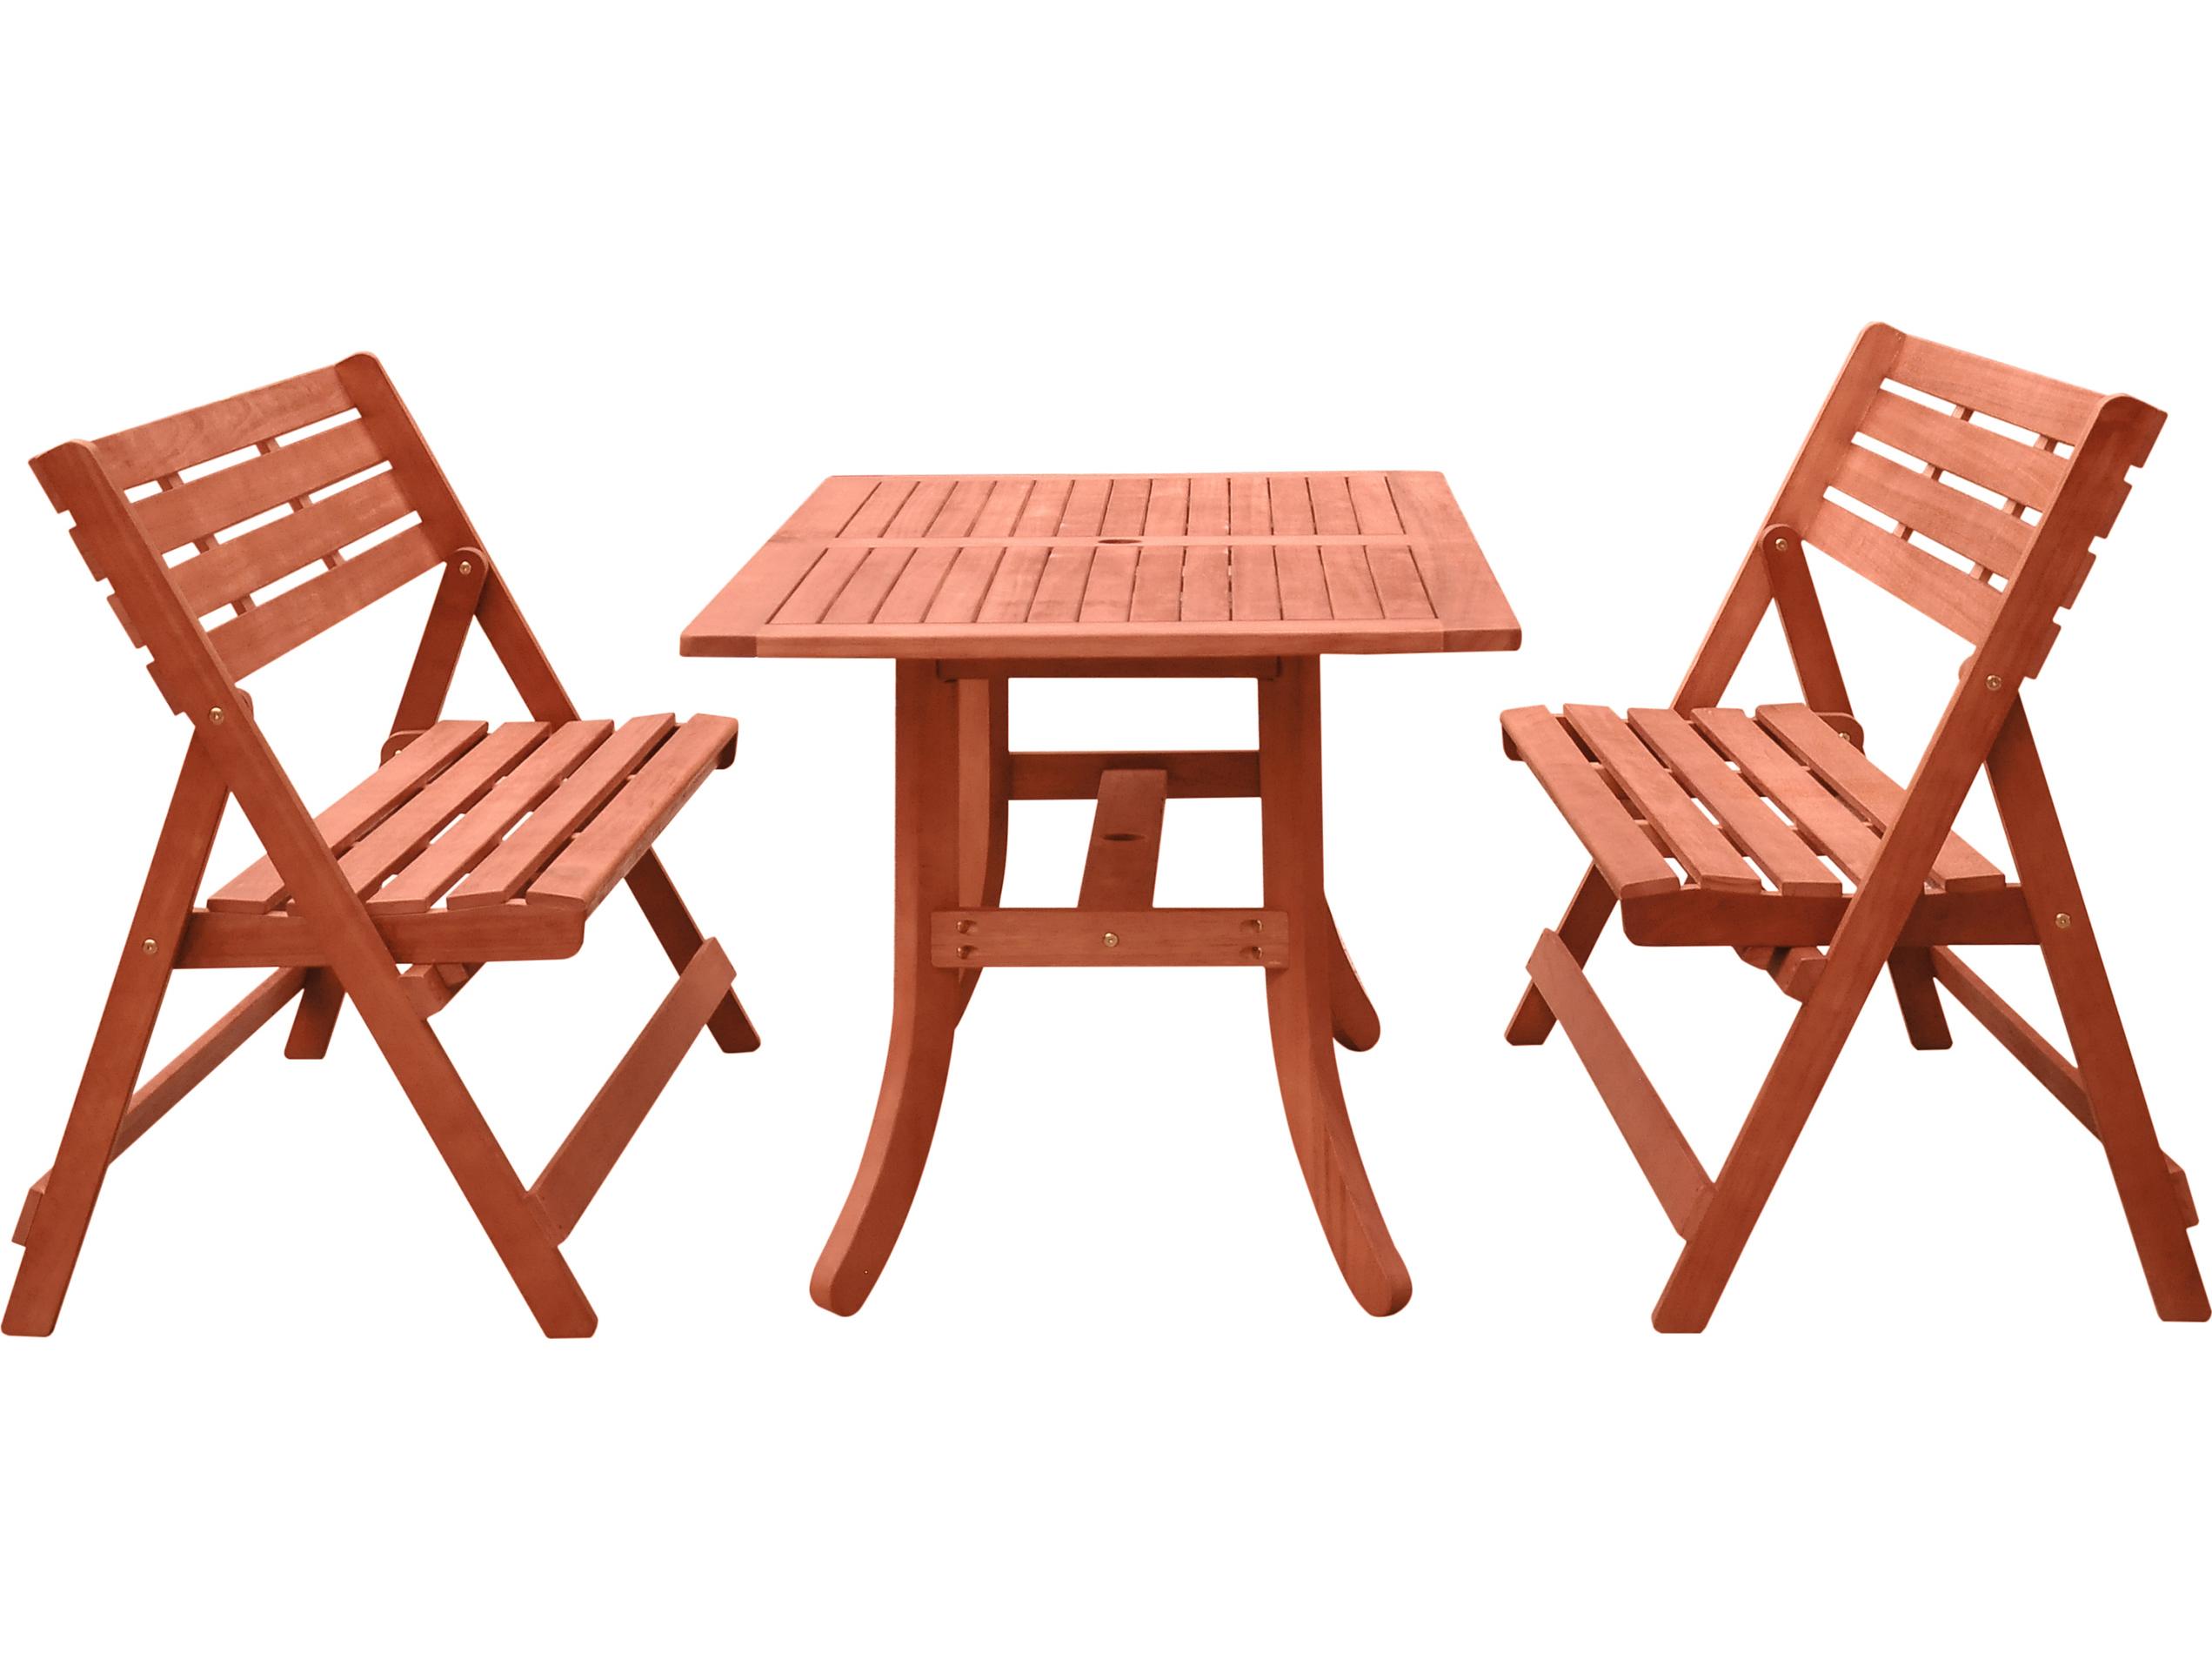 Vifah Malibu 3 Piece Wood Dining Set With Folding Bench